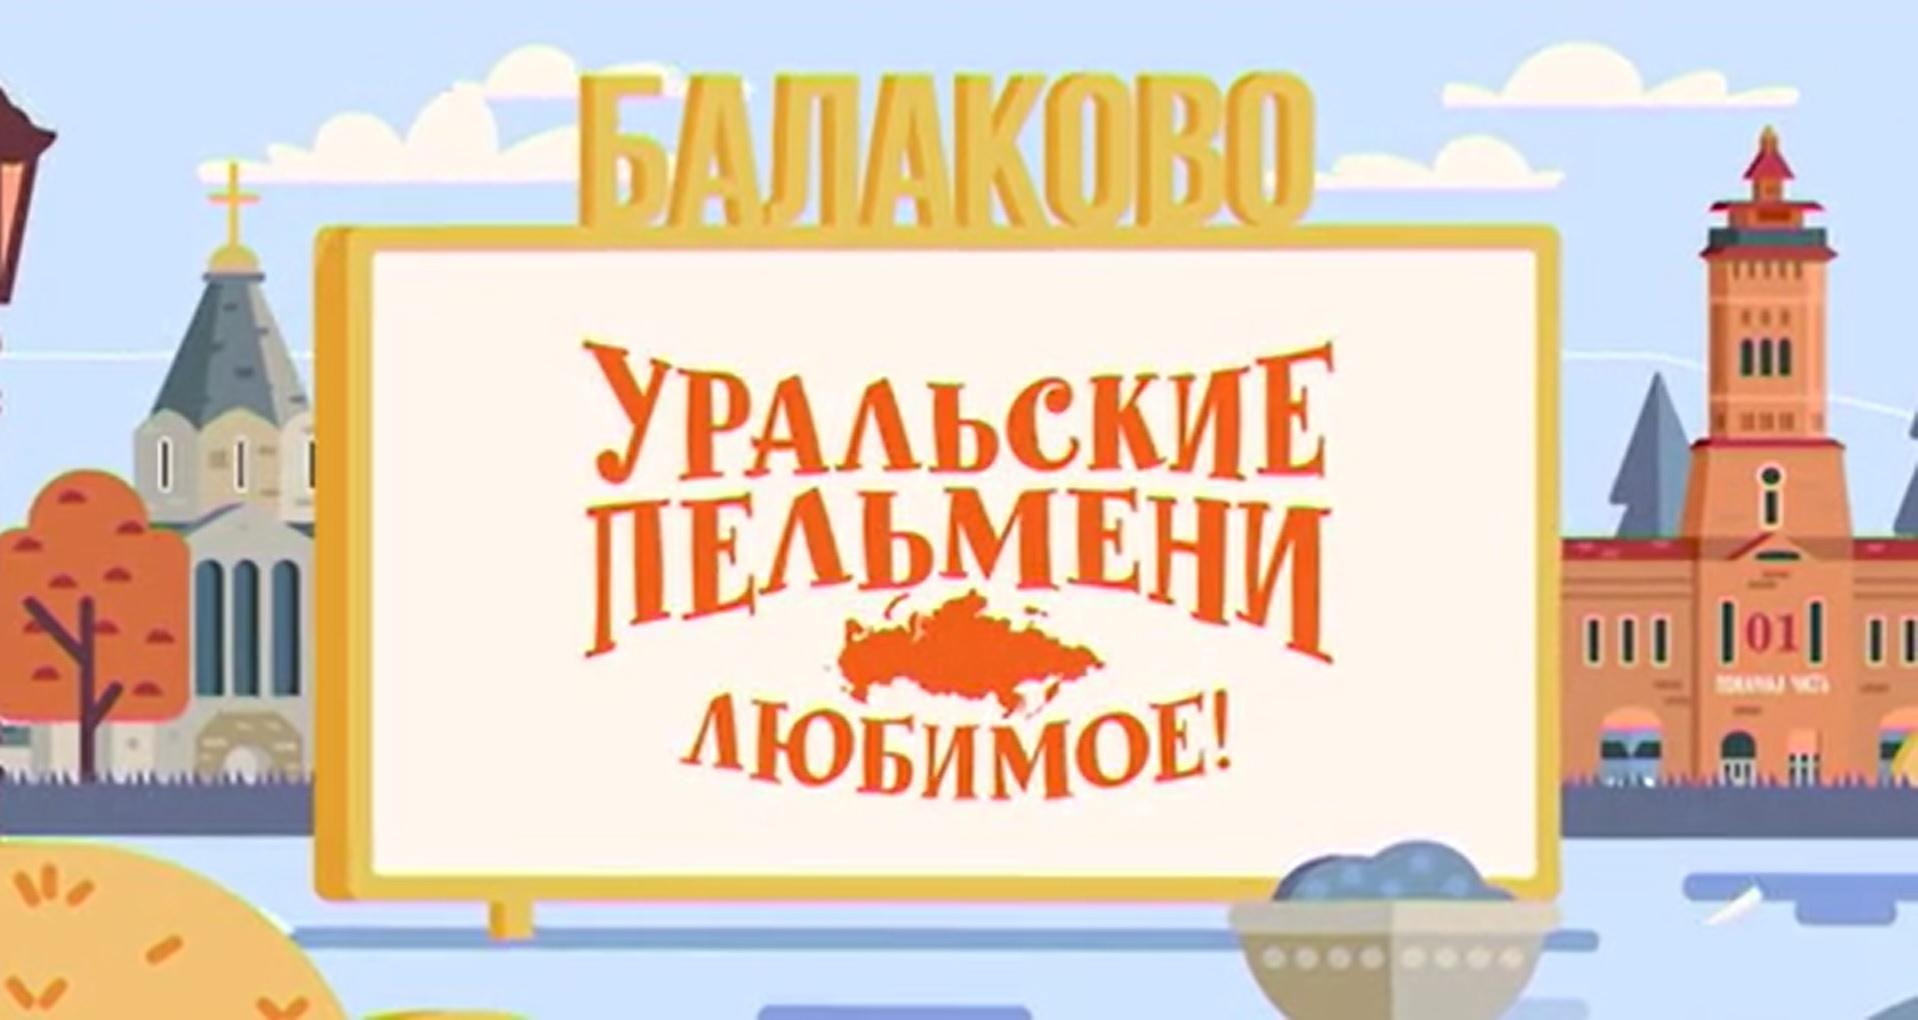 Торческий коллекти Уральские Пельмени Уральские пельмени. Любимое. Балакоо